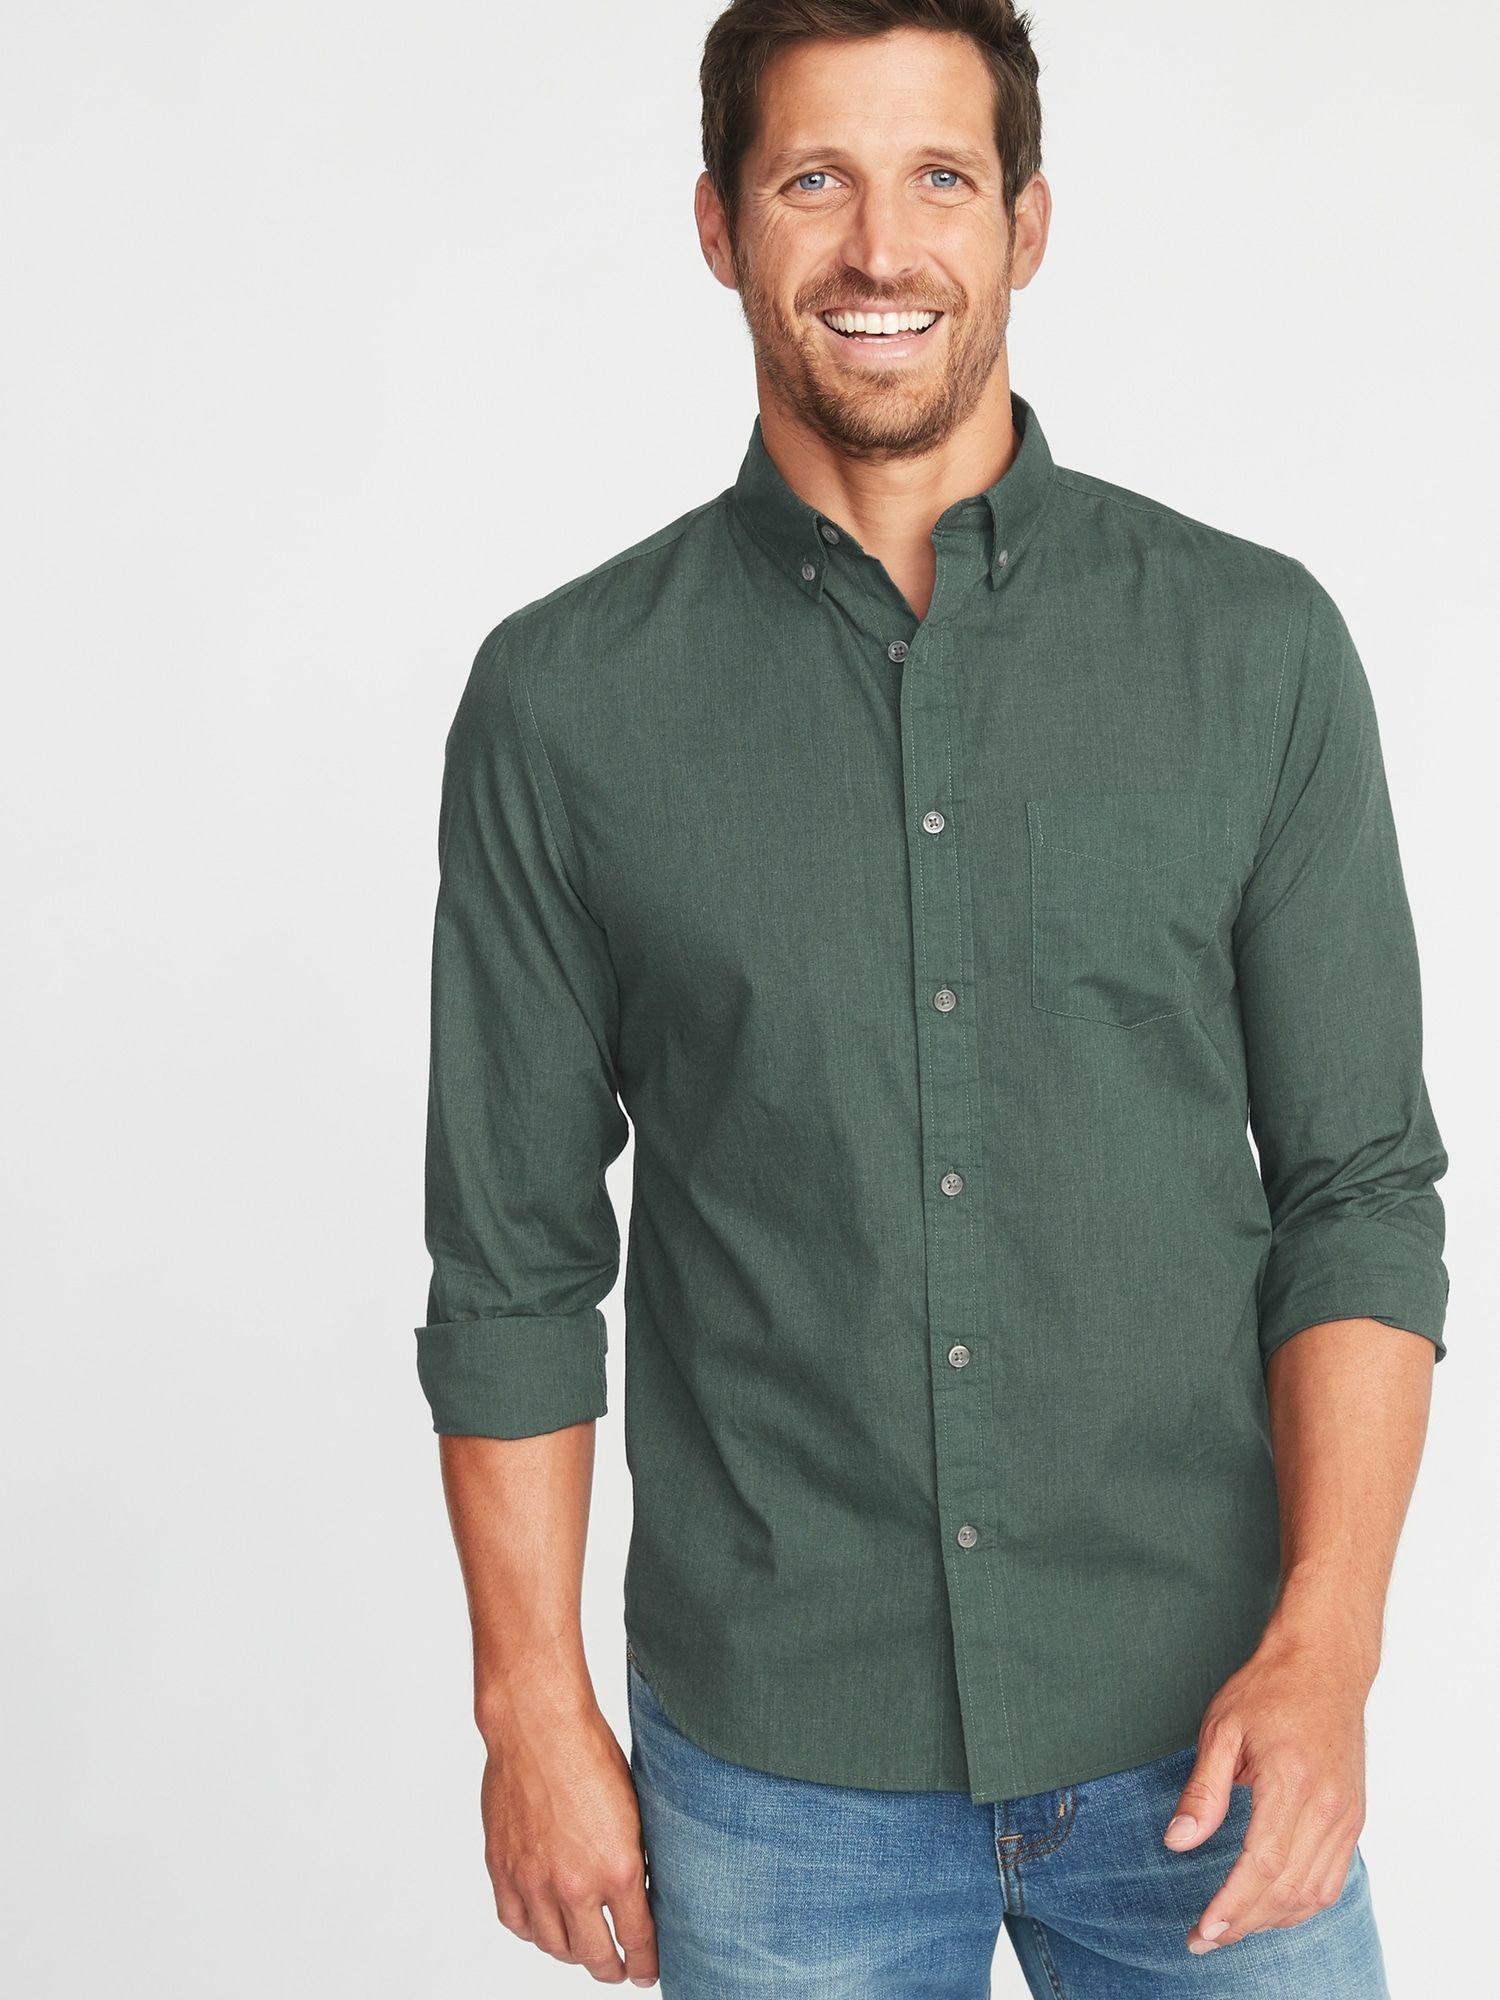 602e2a502d1d26 Slim-Fit Poplin Shirt For Men in 2019   Christmas Wish List   Shirts ...